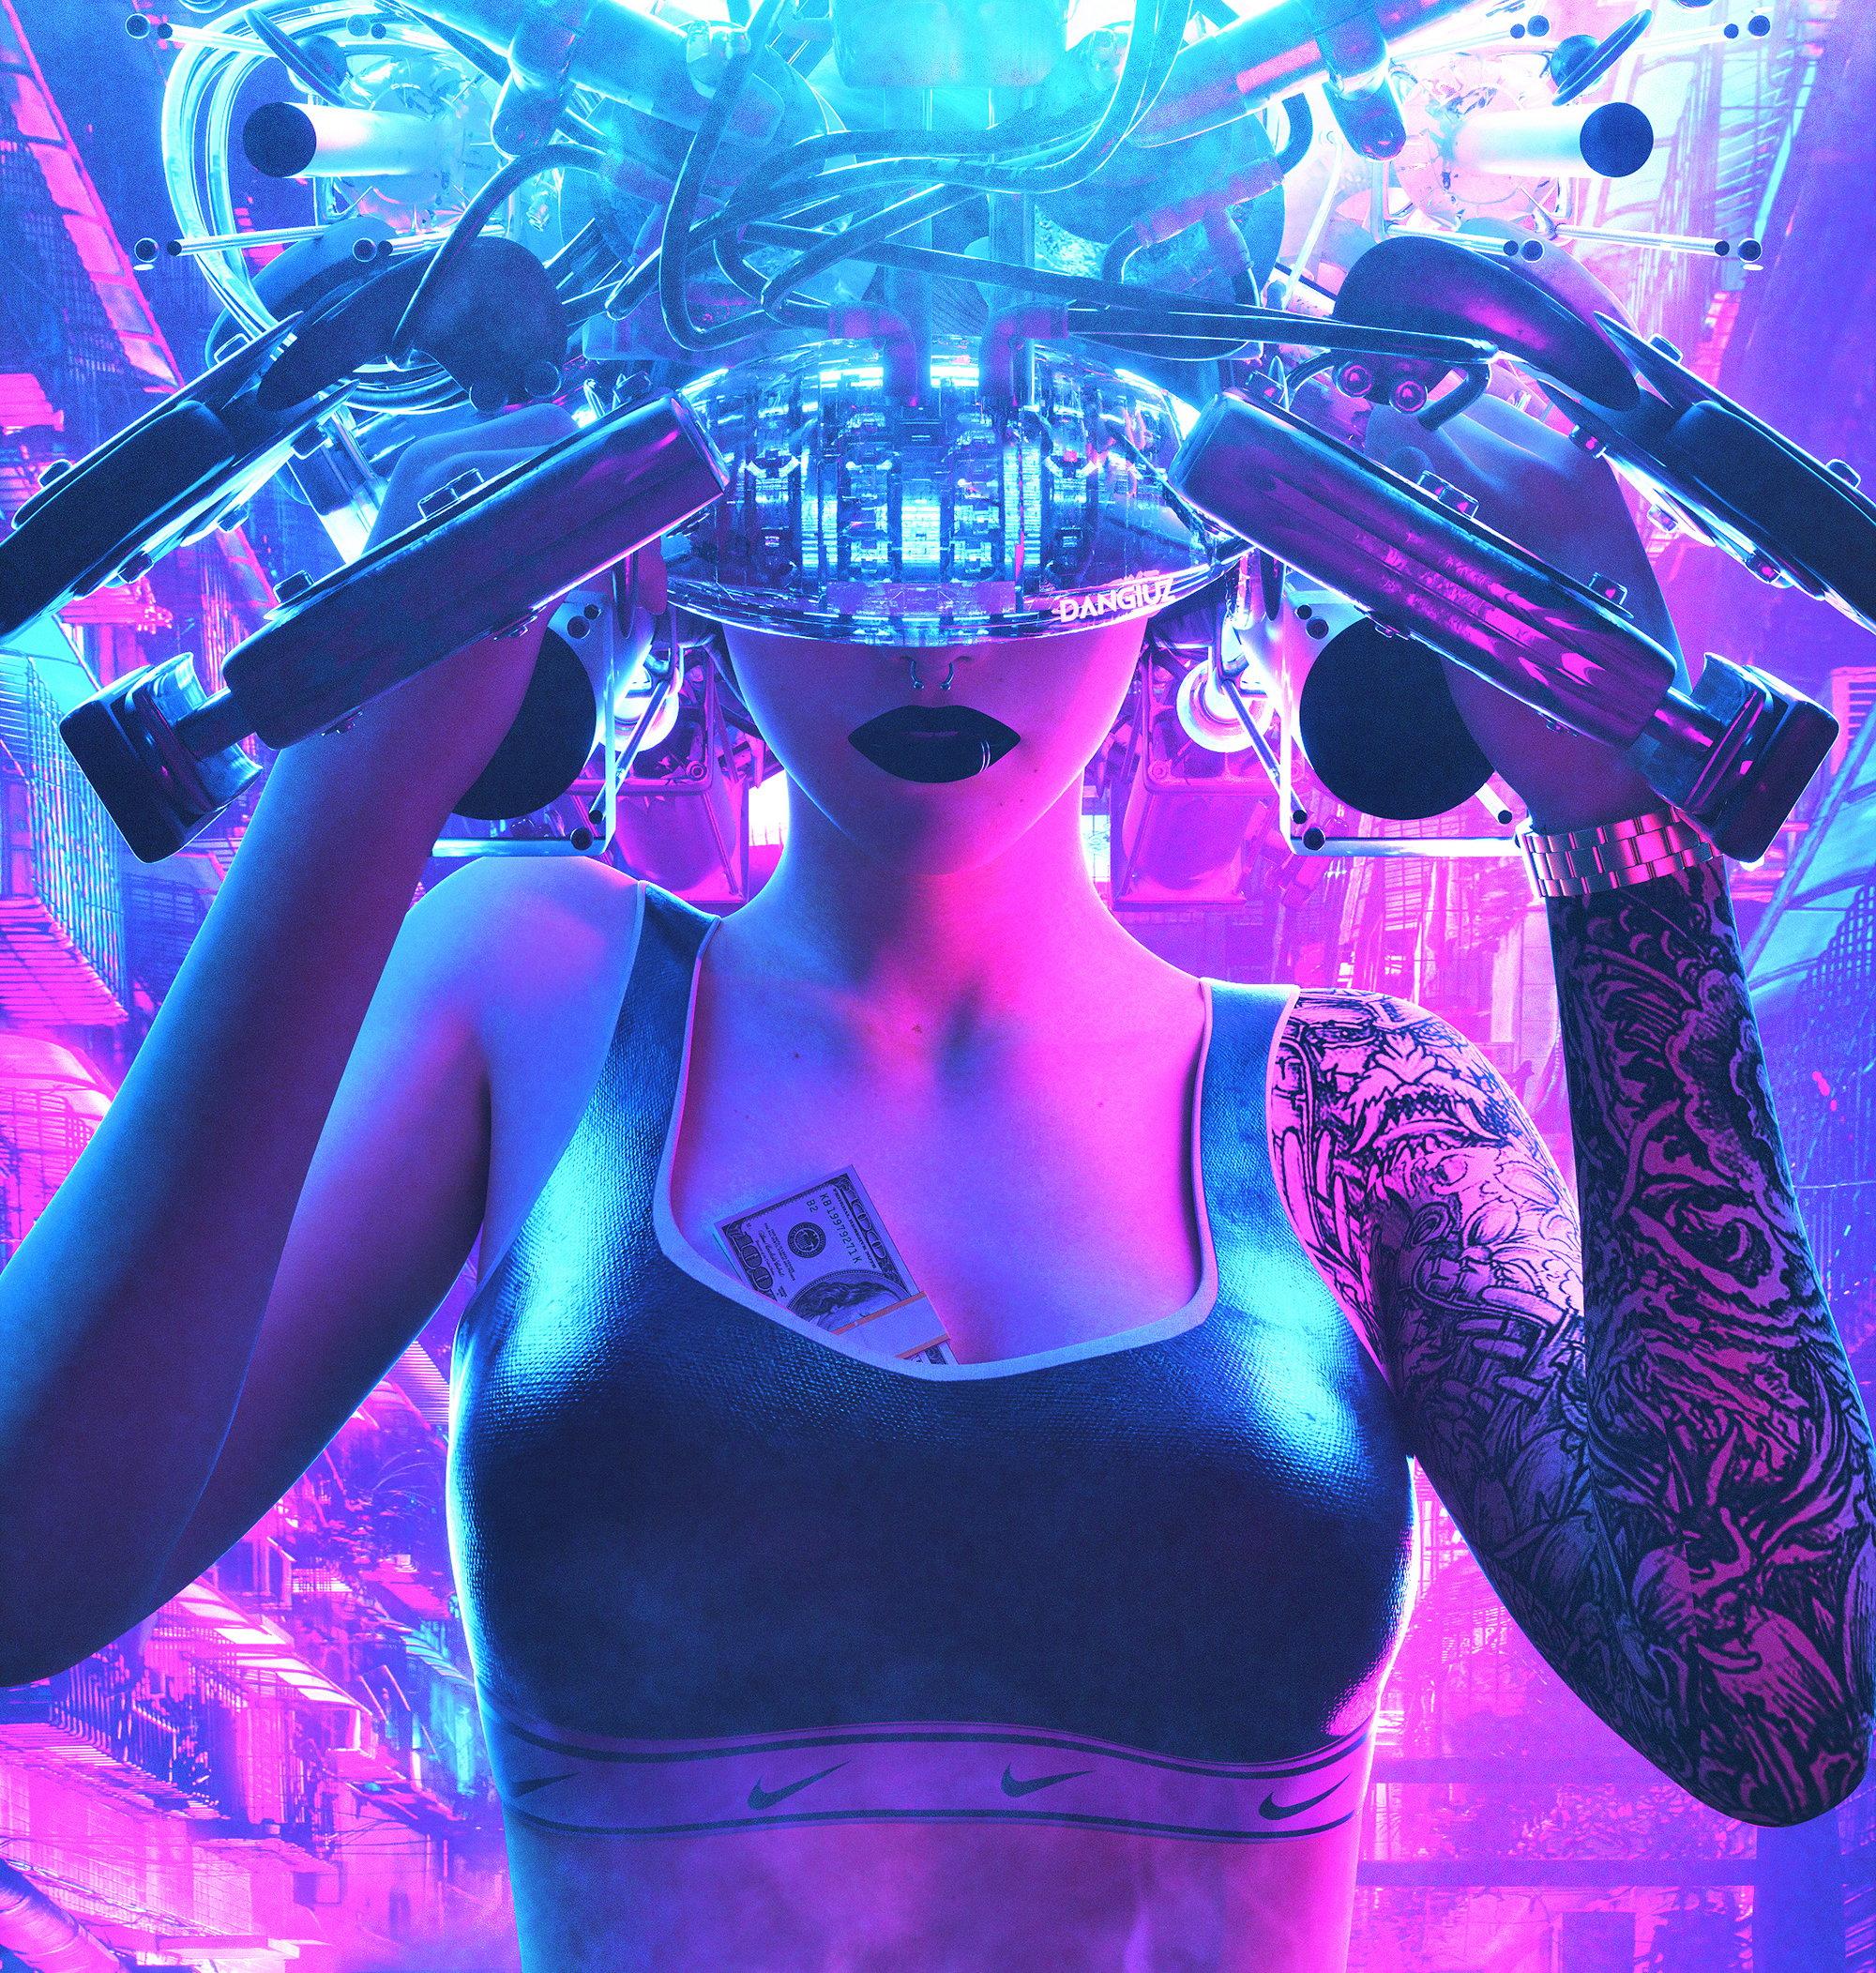 cyberpunk digital art by Dangiuz / Leopoldo D'Angelo